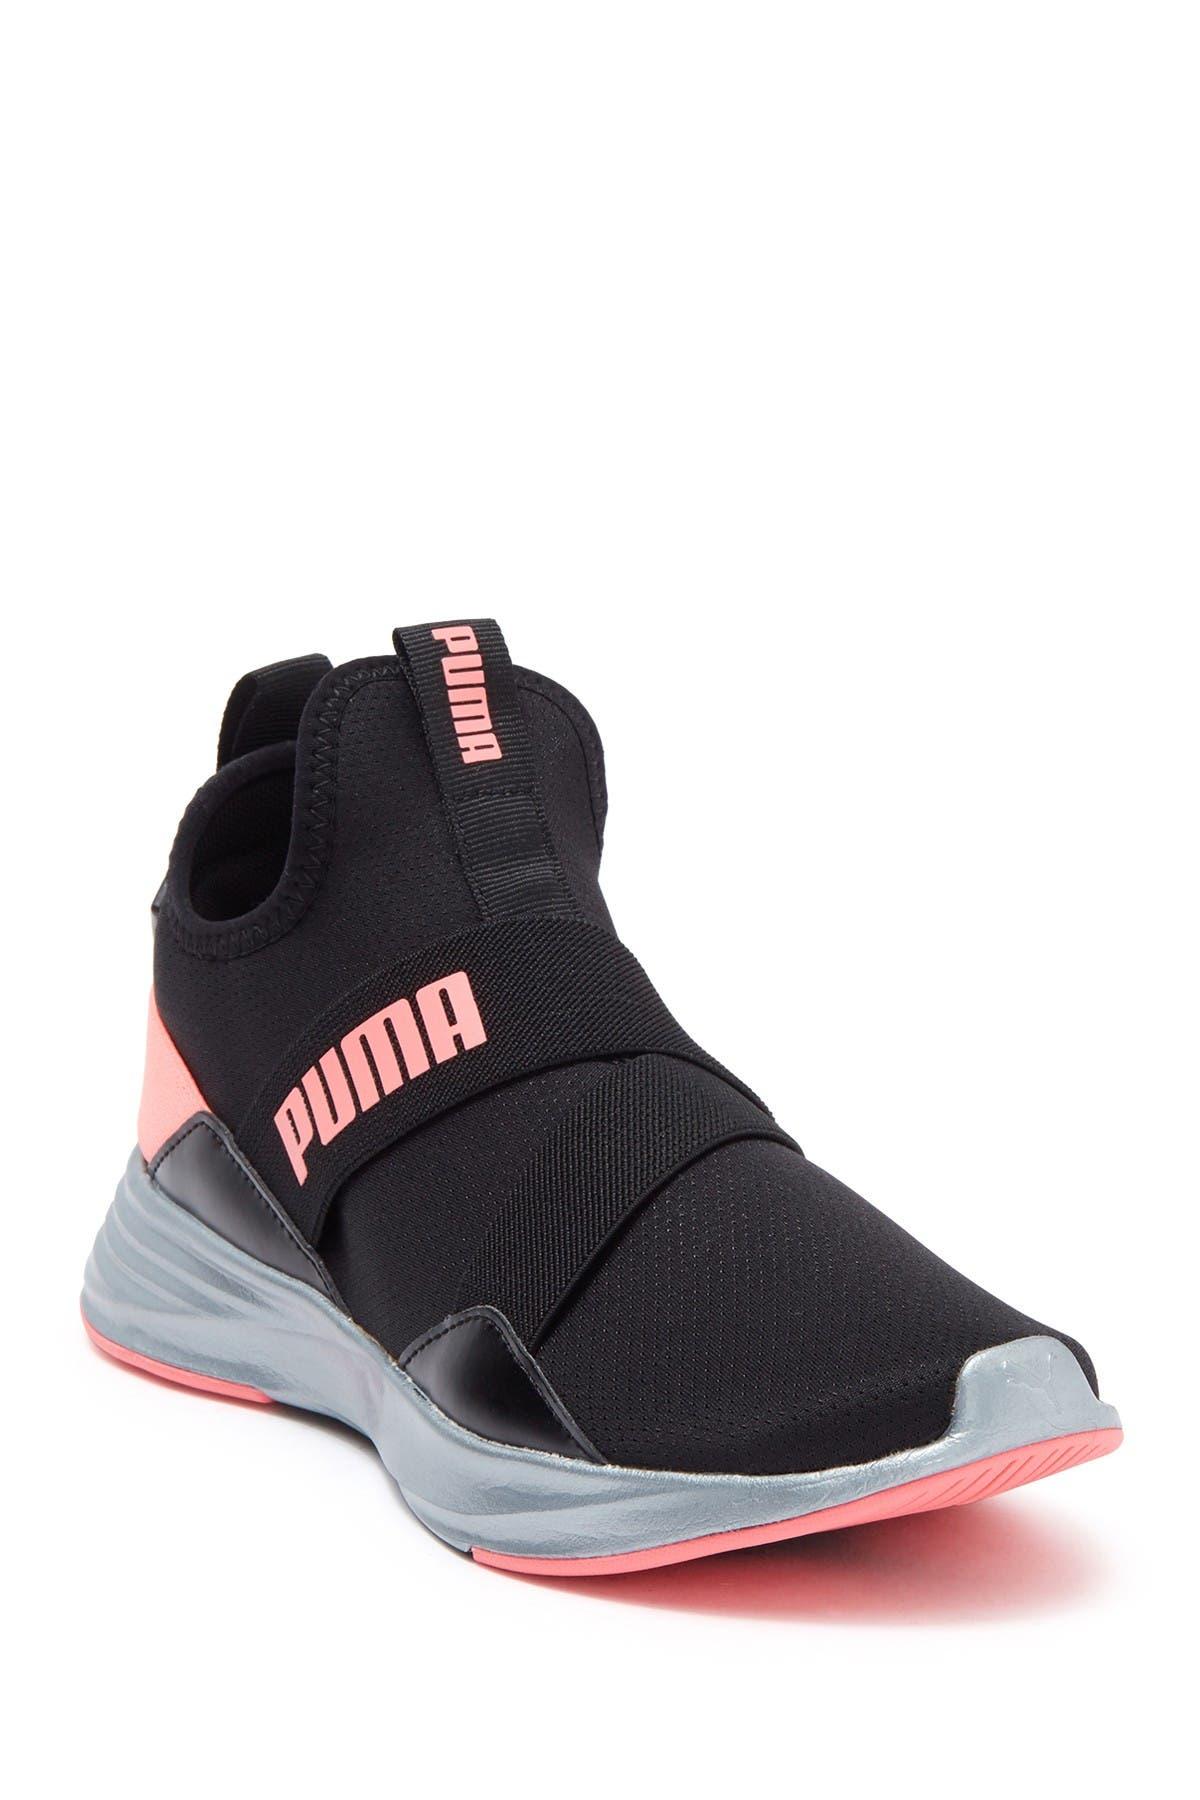 Image of PUMA Radiate Mid Pearl Sneaker